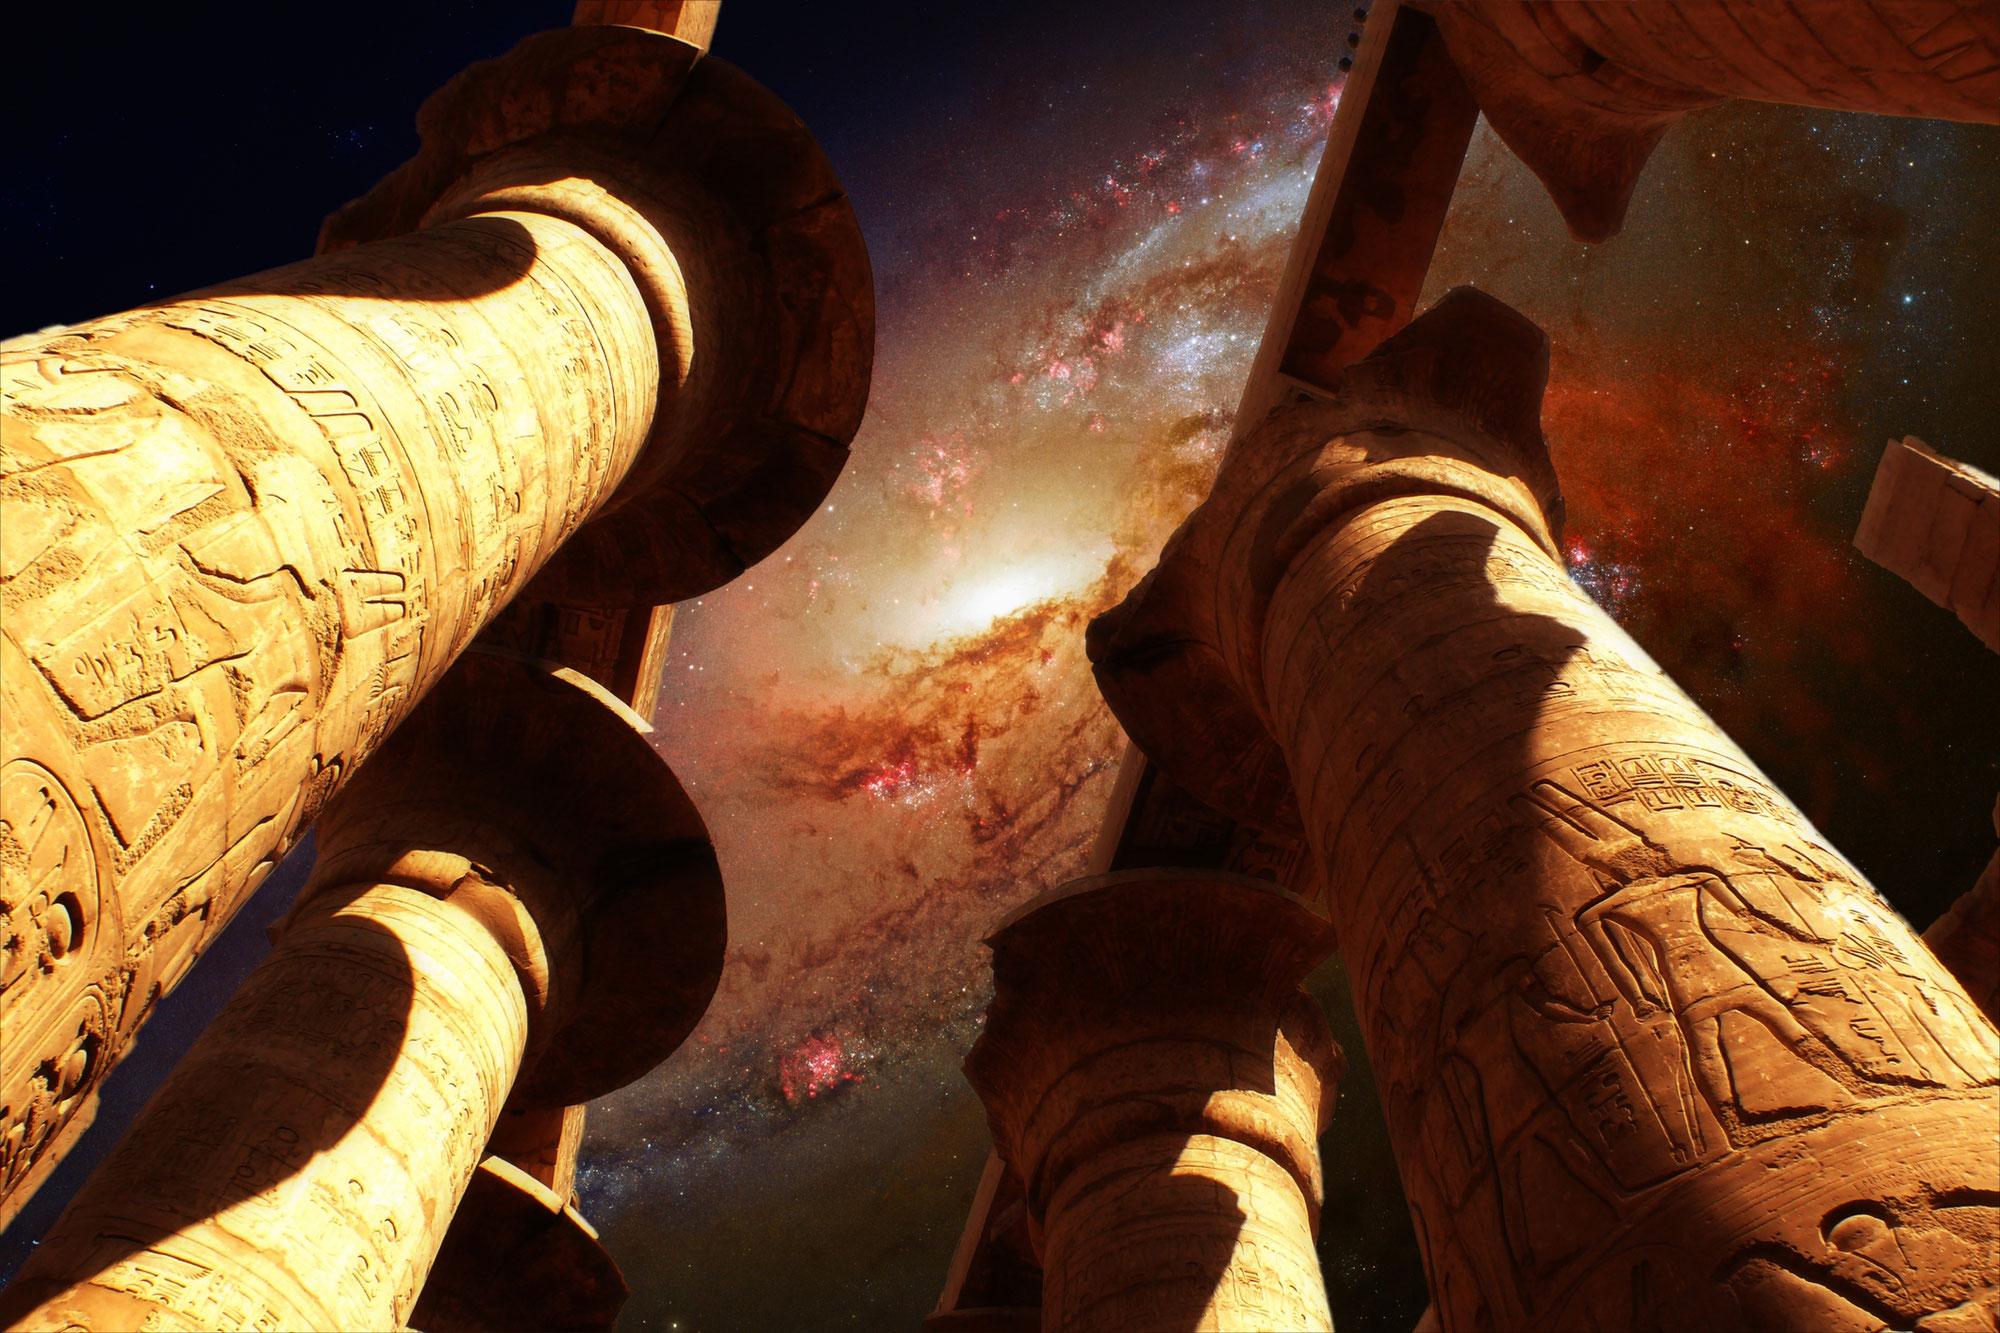 De multidimensionale samensmelting ♥ The Galactic Federation ♥ Lichtwerkers Nederland